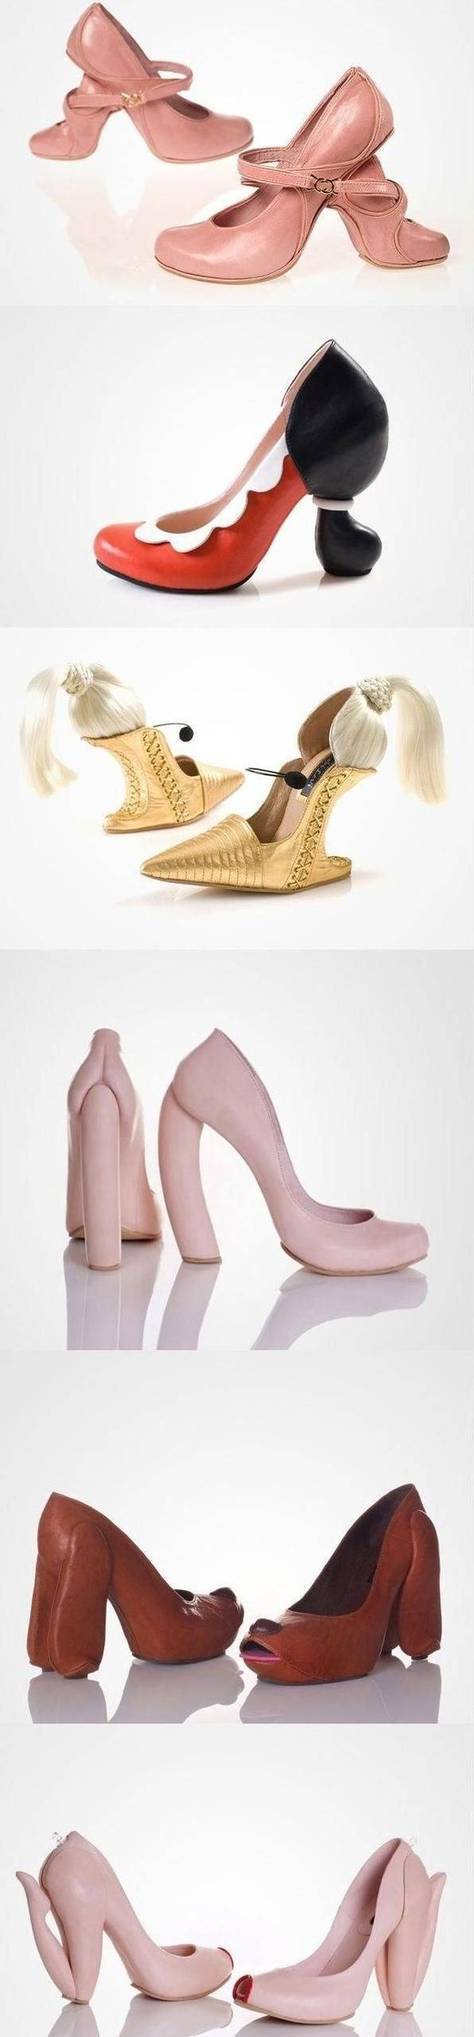 sepatu high heels yang unik (3)